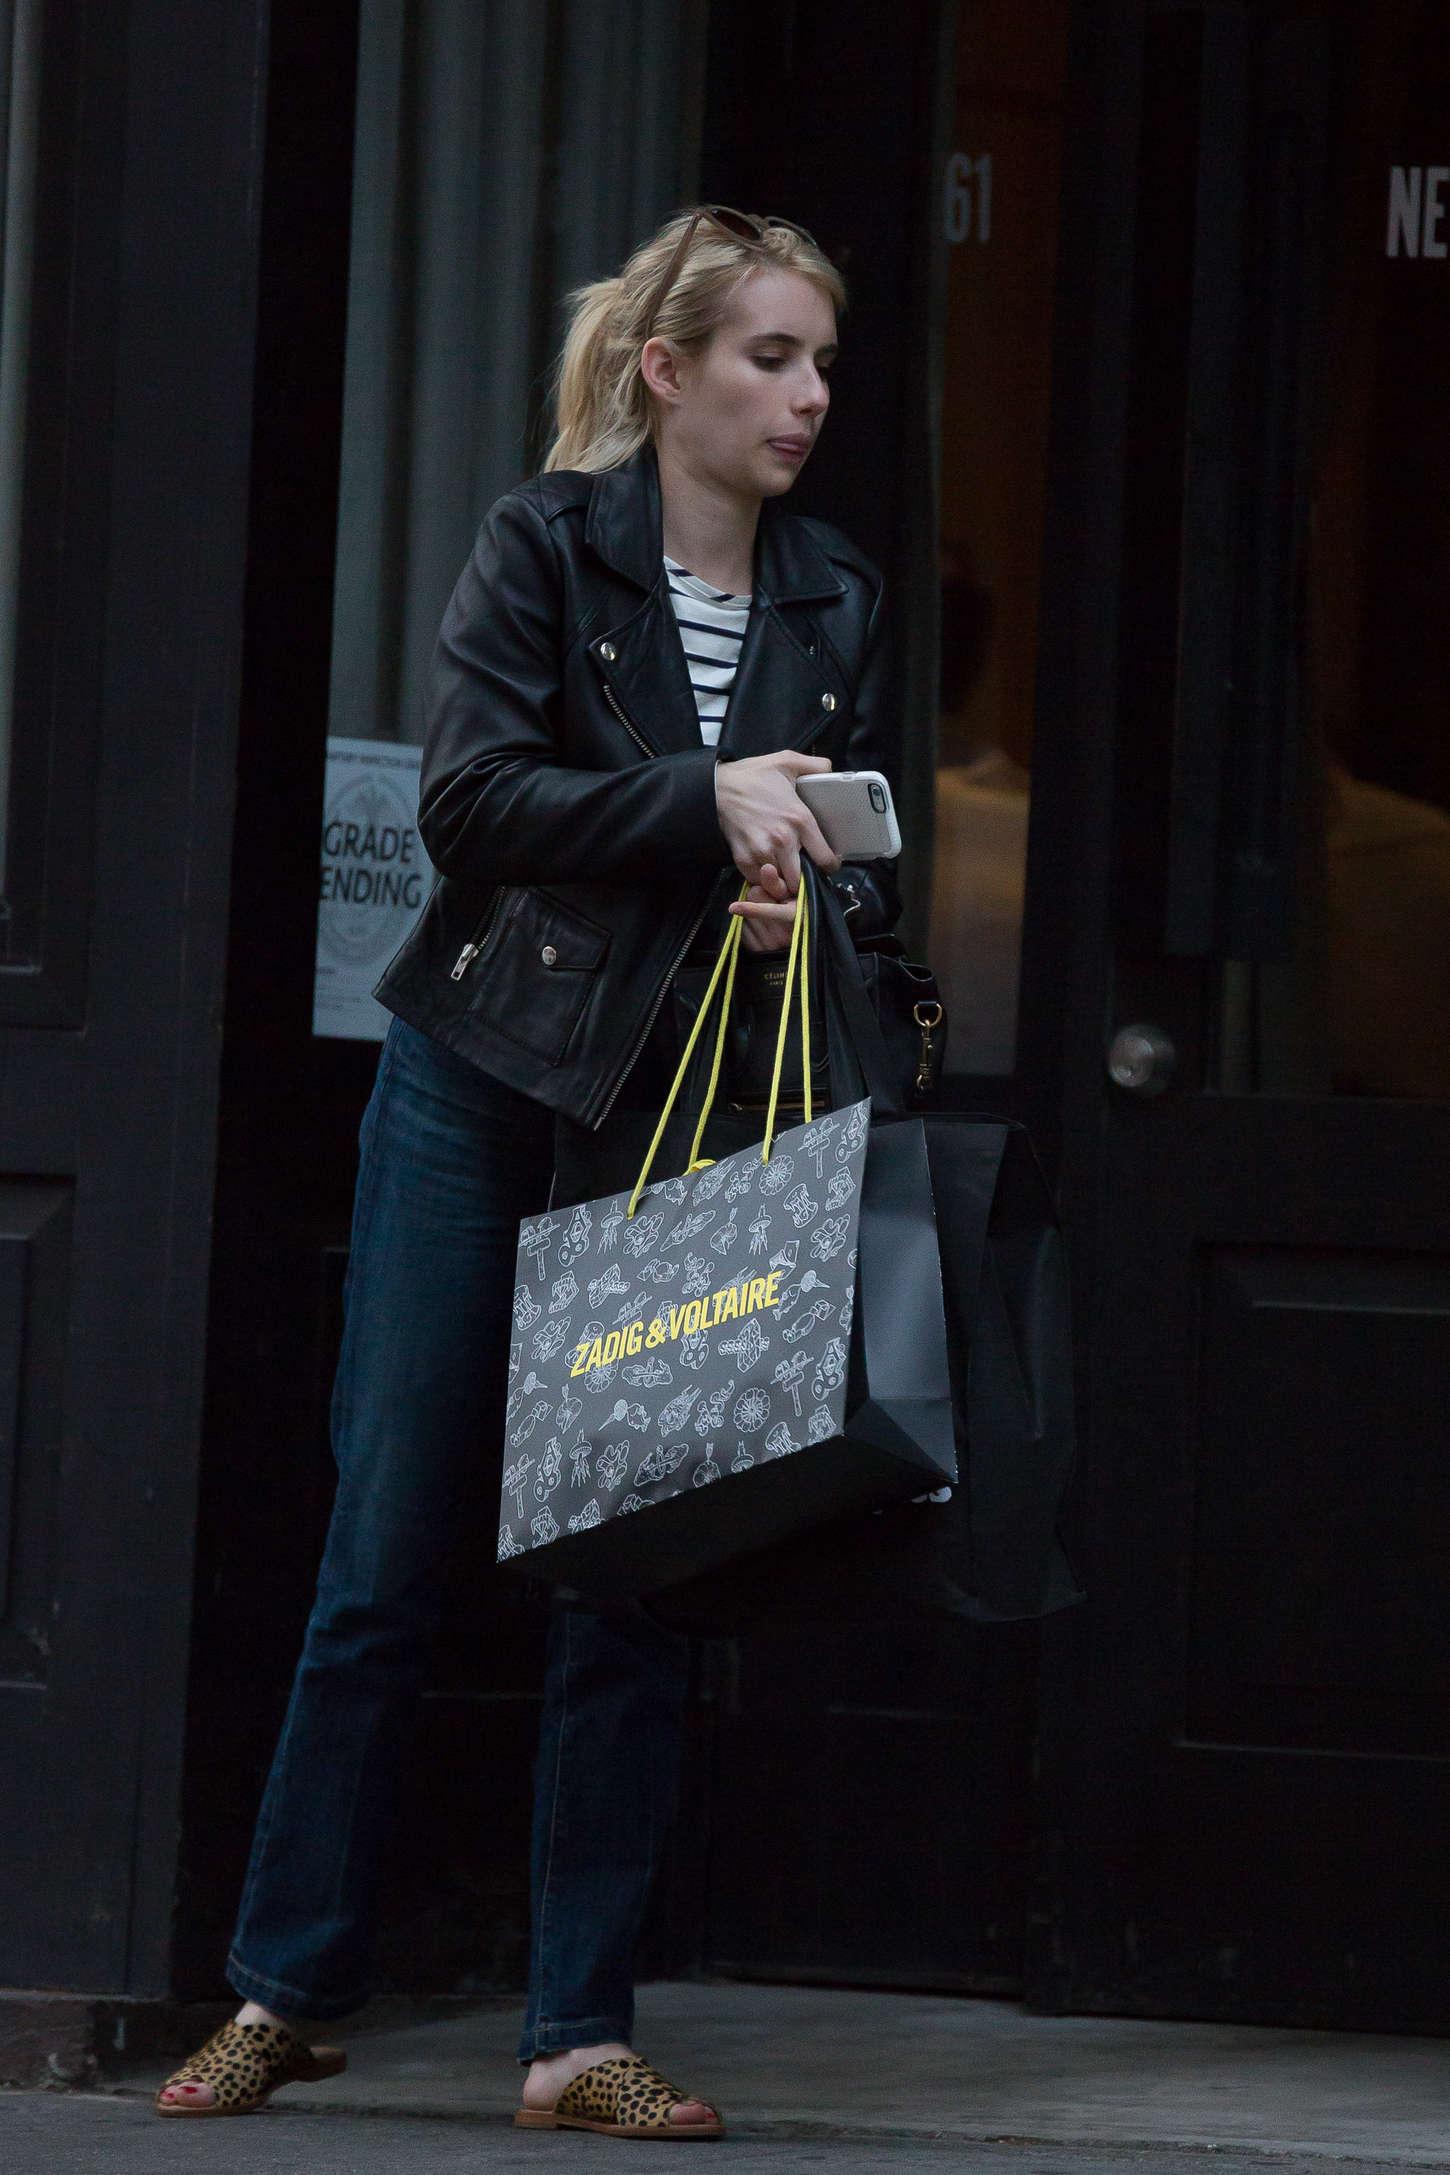 Emma Roberts 2015 : Emma Roberts in Jeans -08